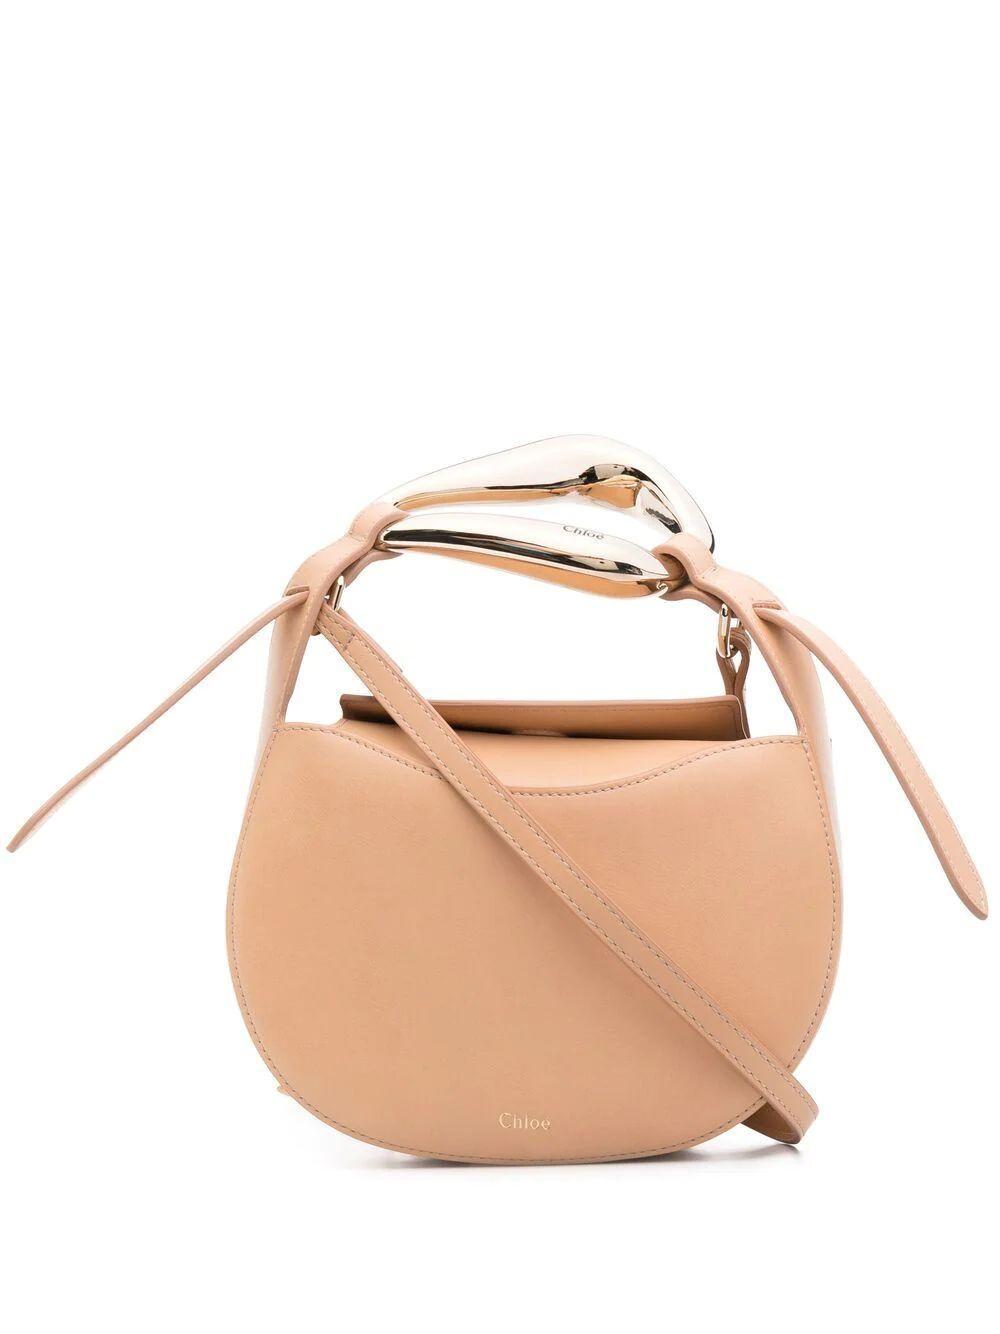 Small Kiss Bag Item # CHC21US350E48